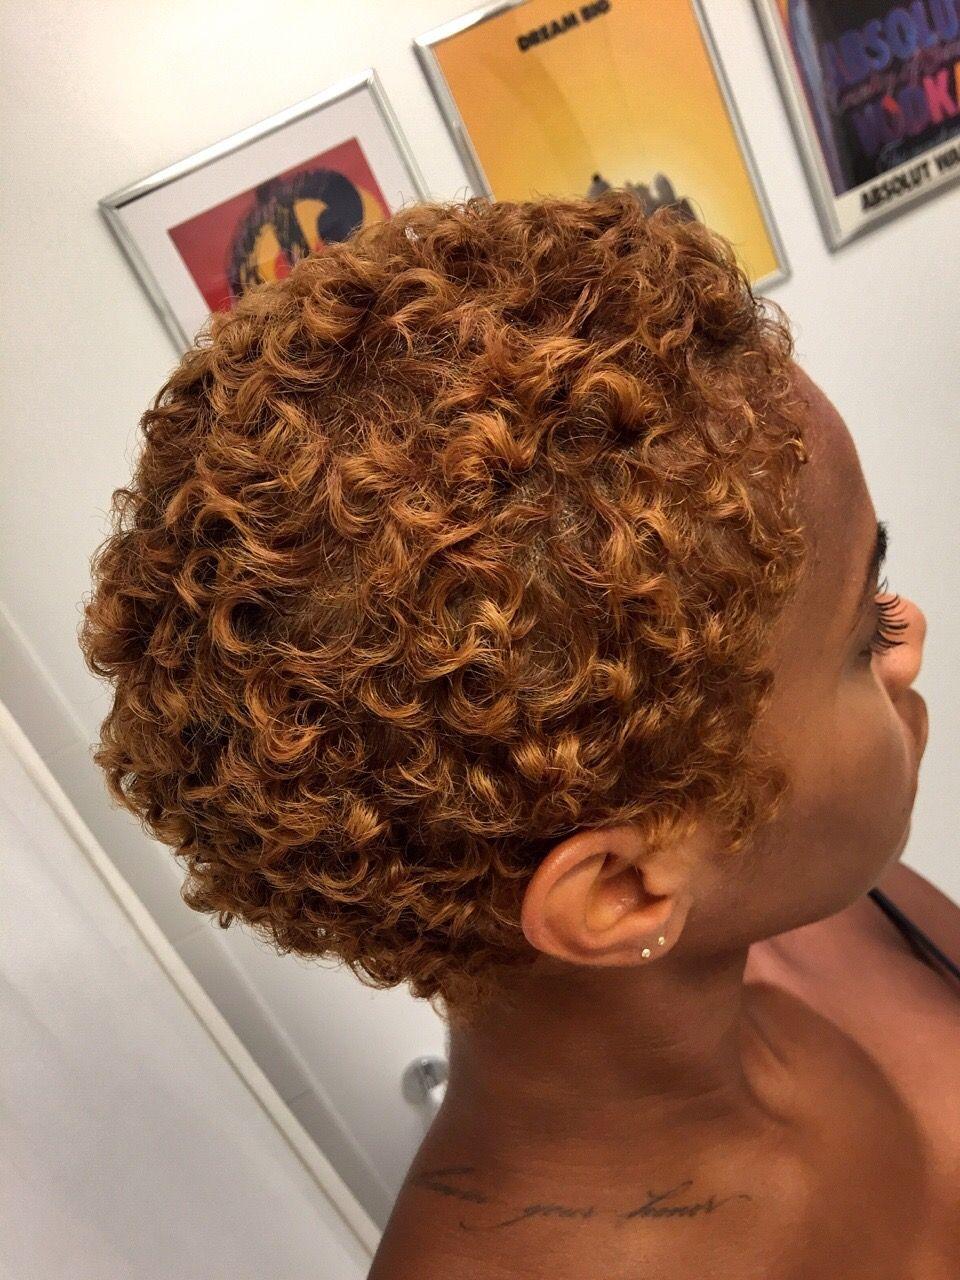 Pinterest rebelwithstyle my hair pinterest short hair